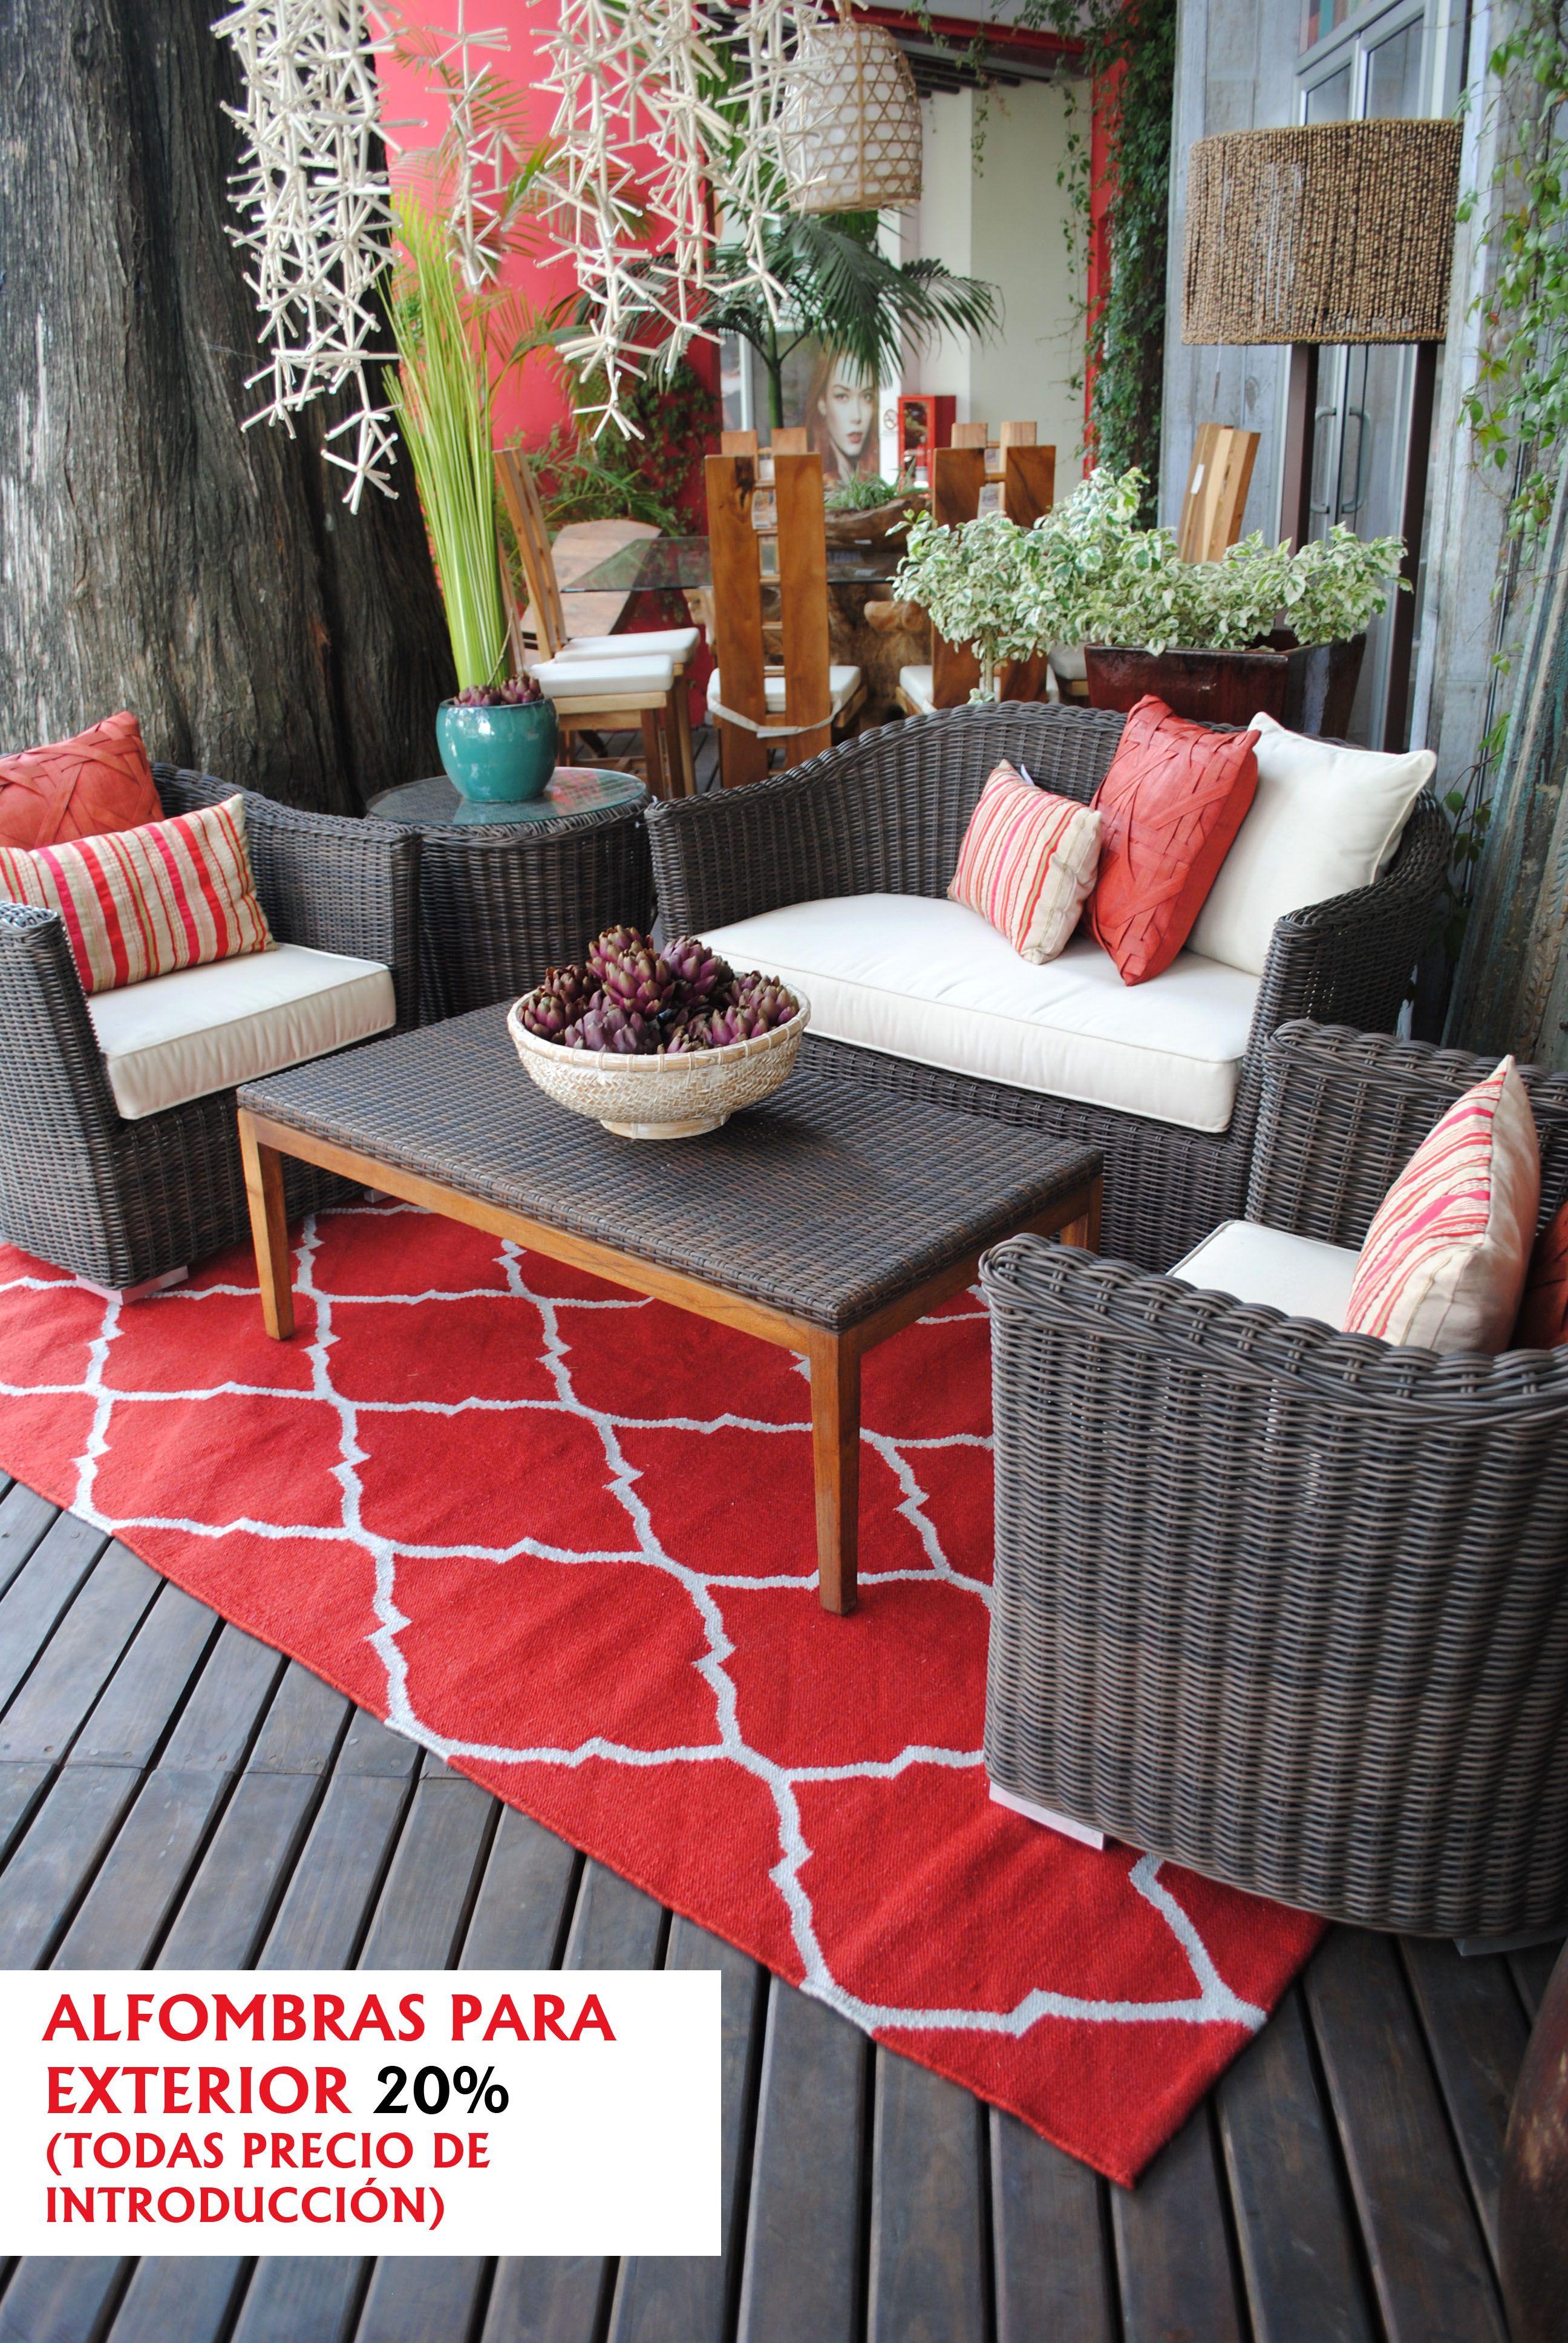 alfombras para exterior | Paisajismo | Pinterest | Paisajismo